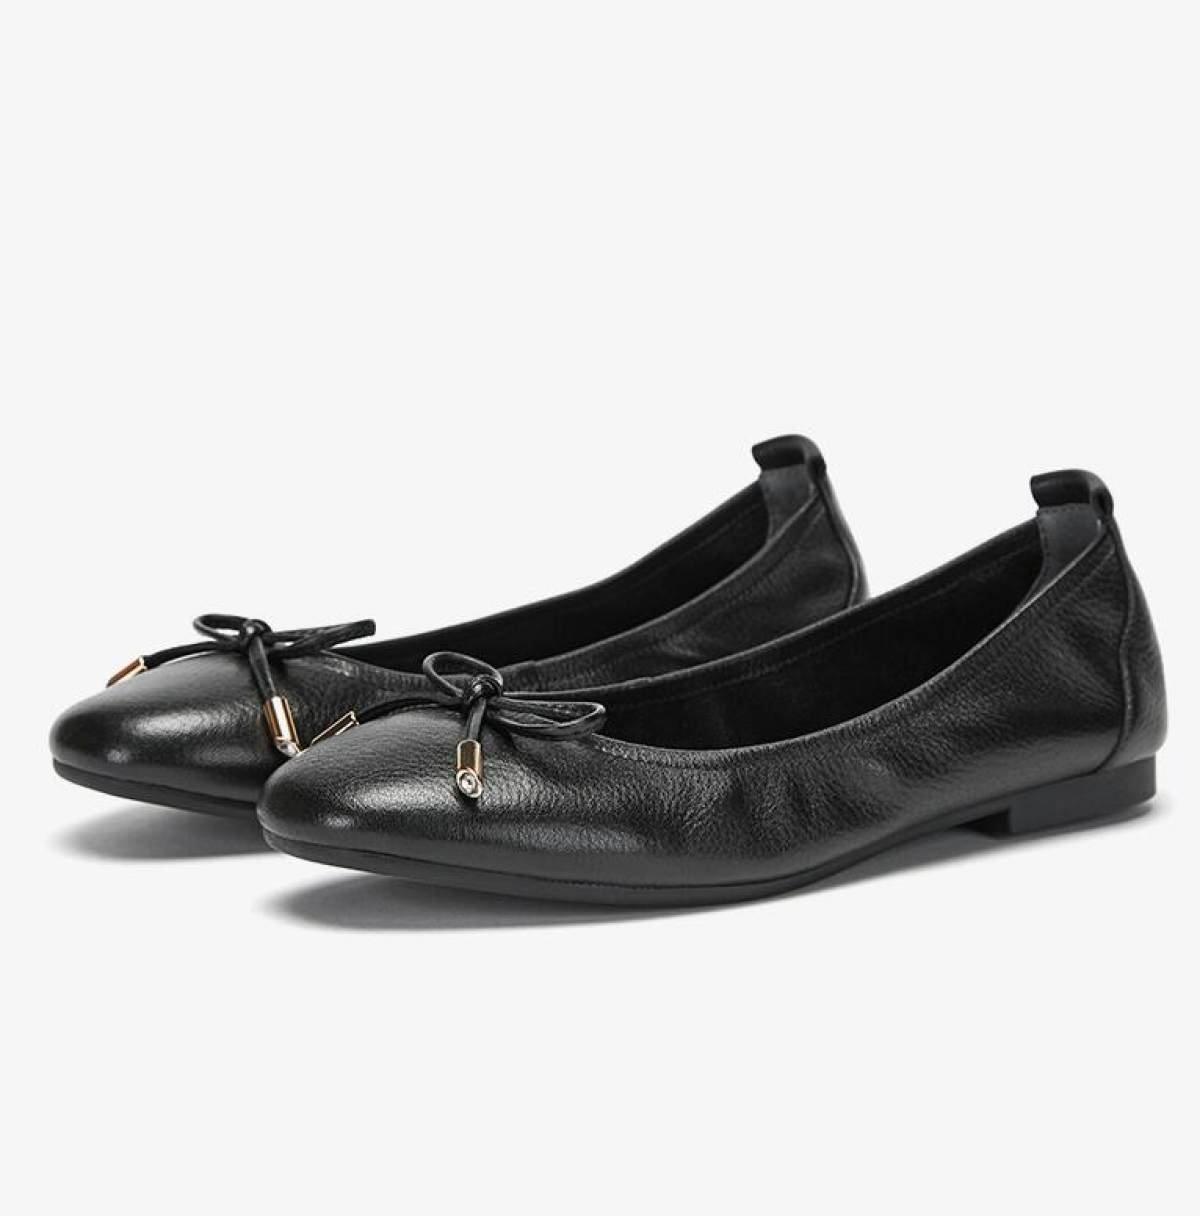 Bean Round Comode Barca Ximu Da New Shoes Bow Scarpe wOxtE6